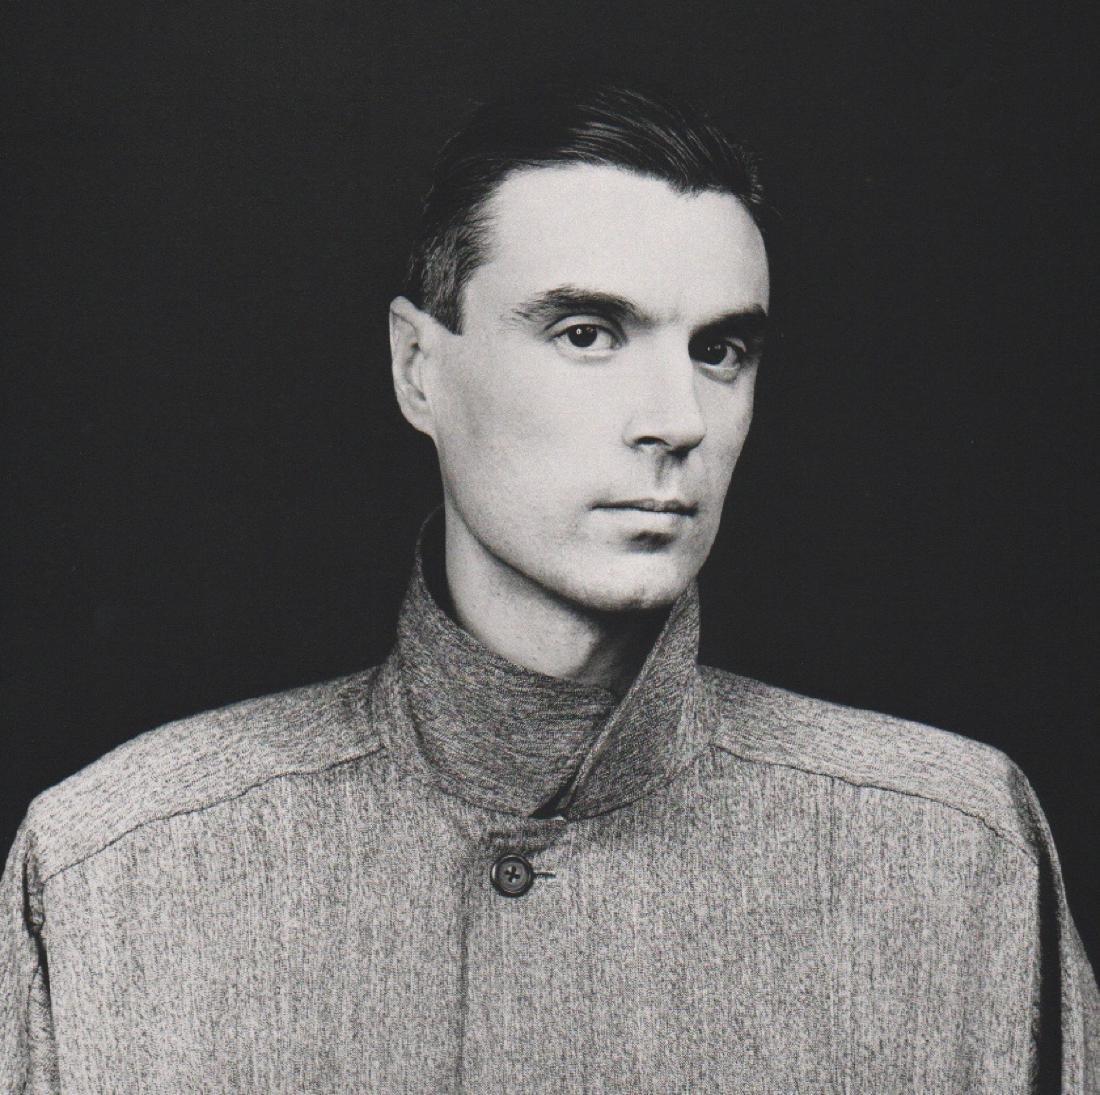 ROBERT MAPPLETHORPE - David Byrne, 1983